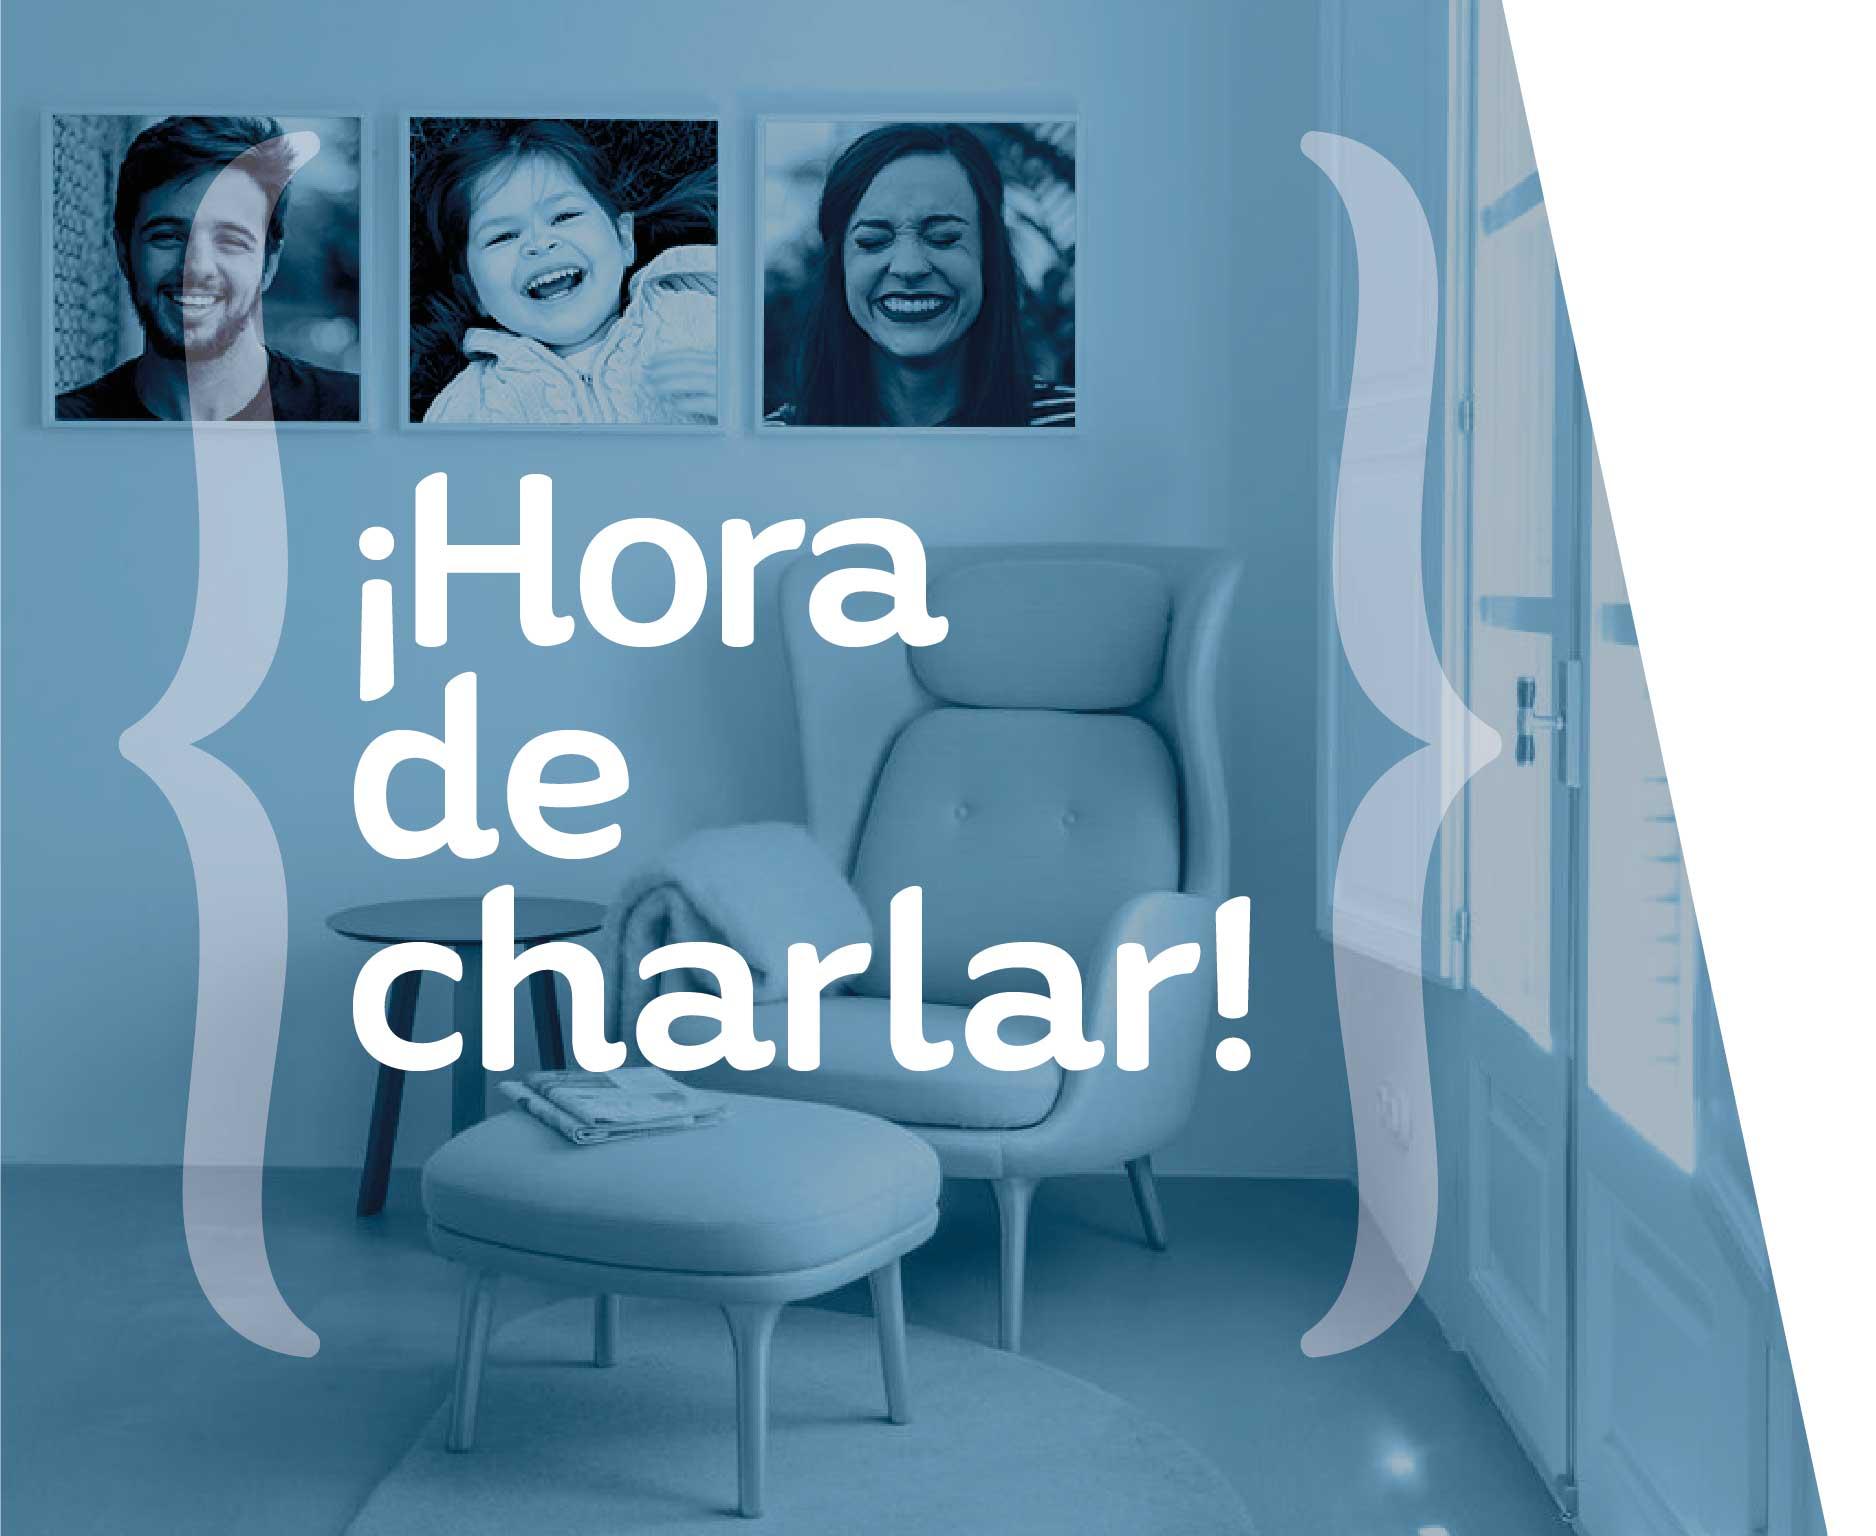 charlar-41